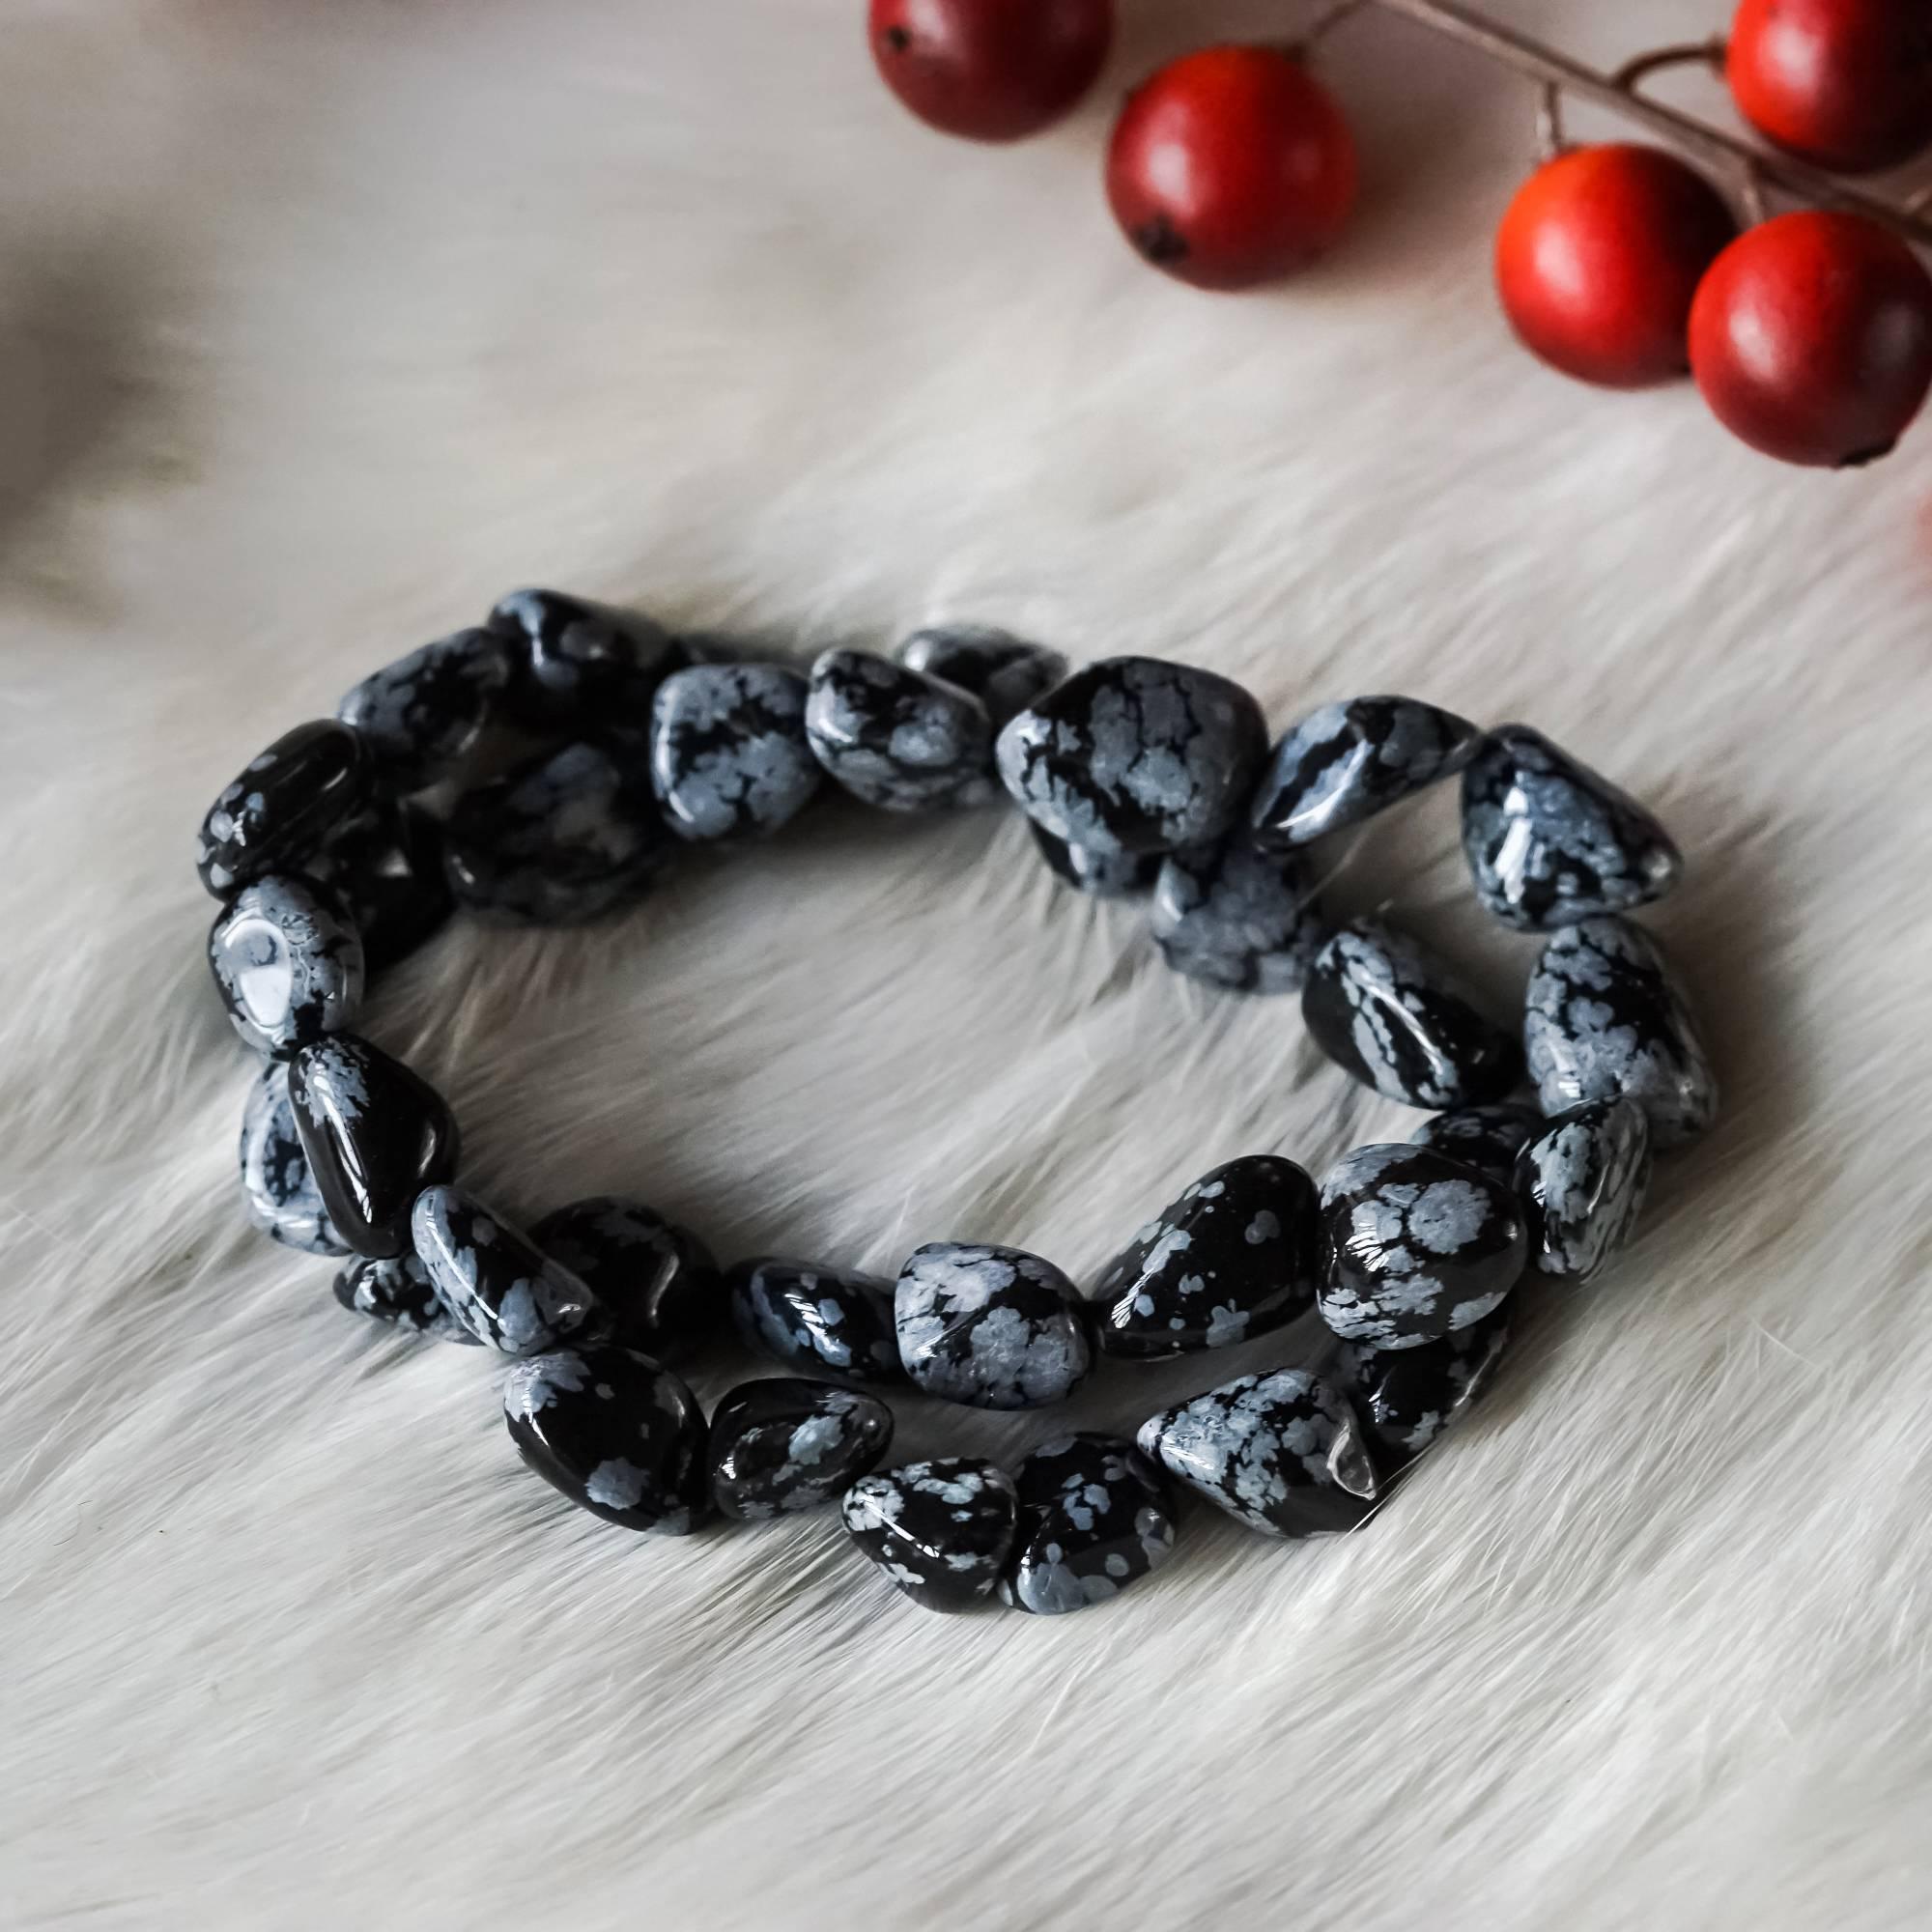 Snowflake Obsidian Bracelets For Revelation And Shadow Integration 22 00